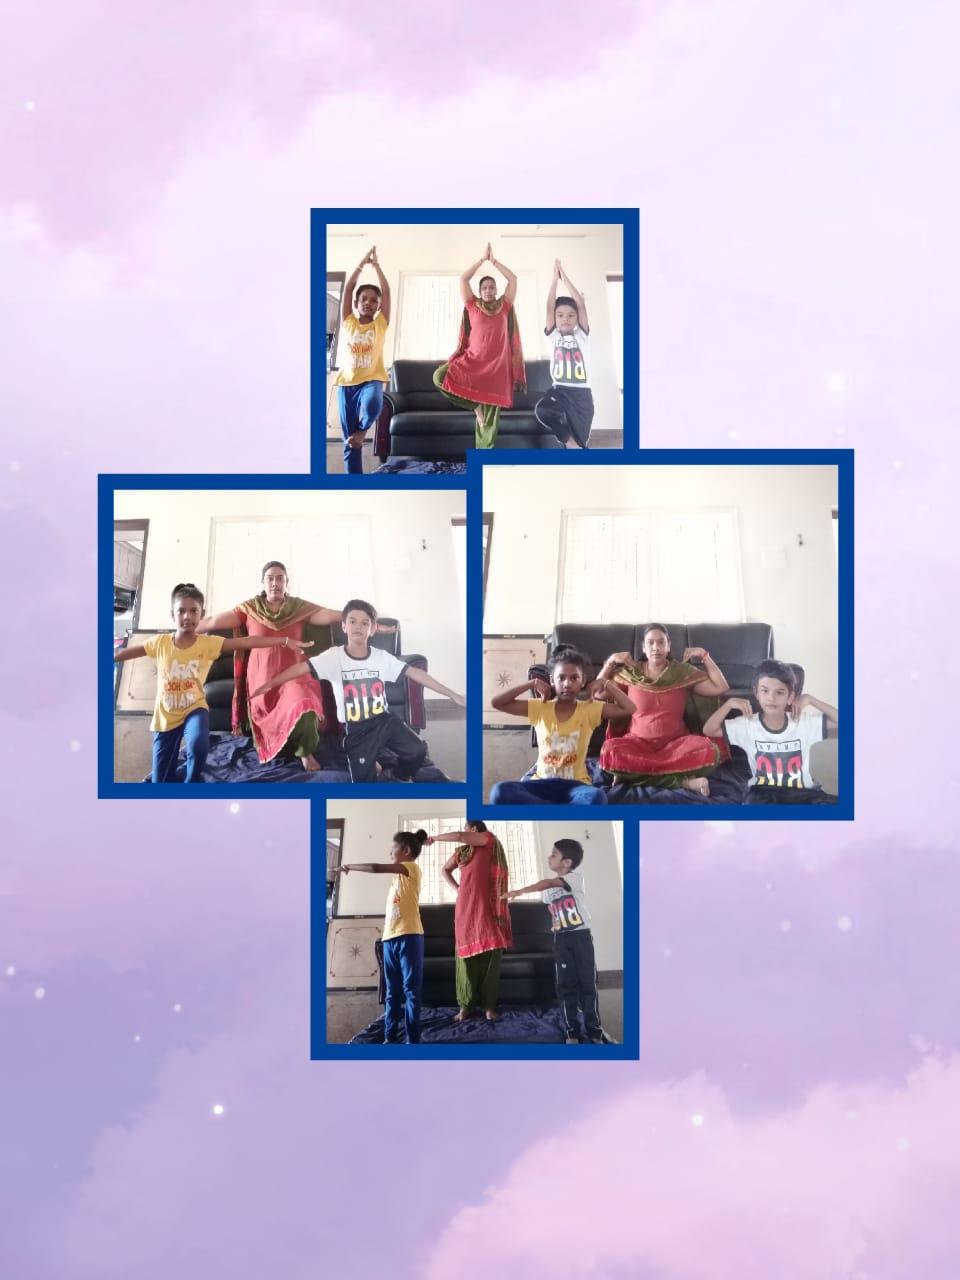 Fitness Freak Class – I